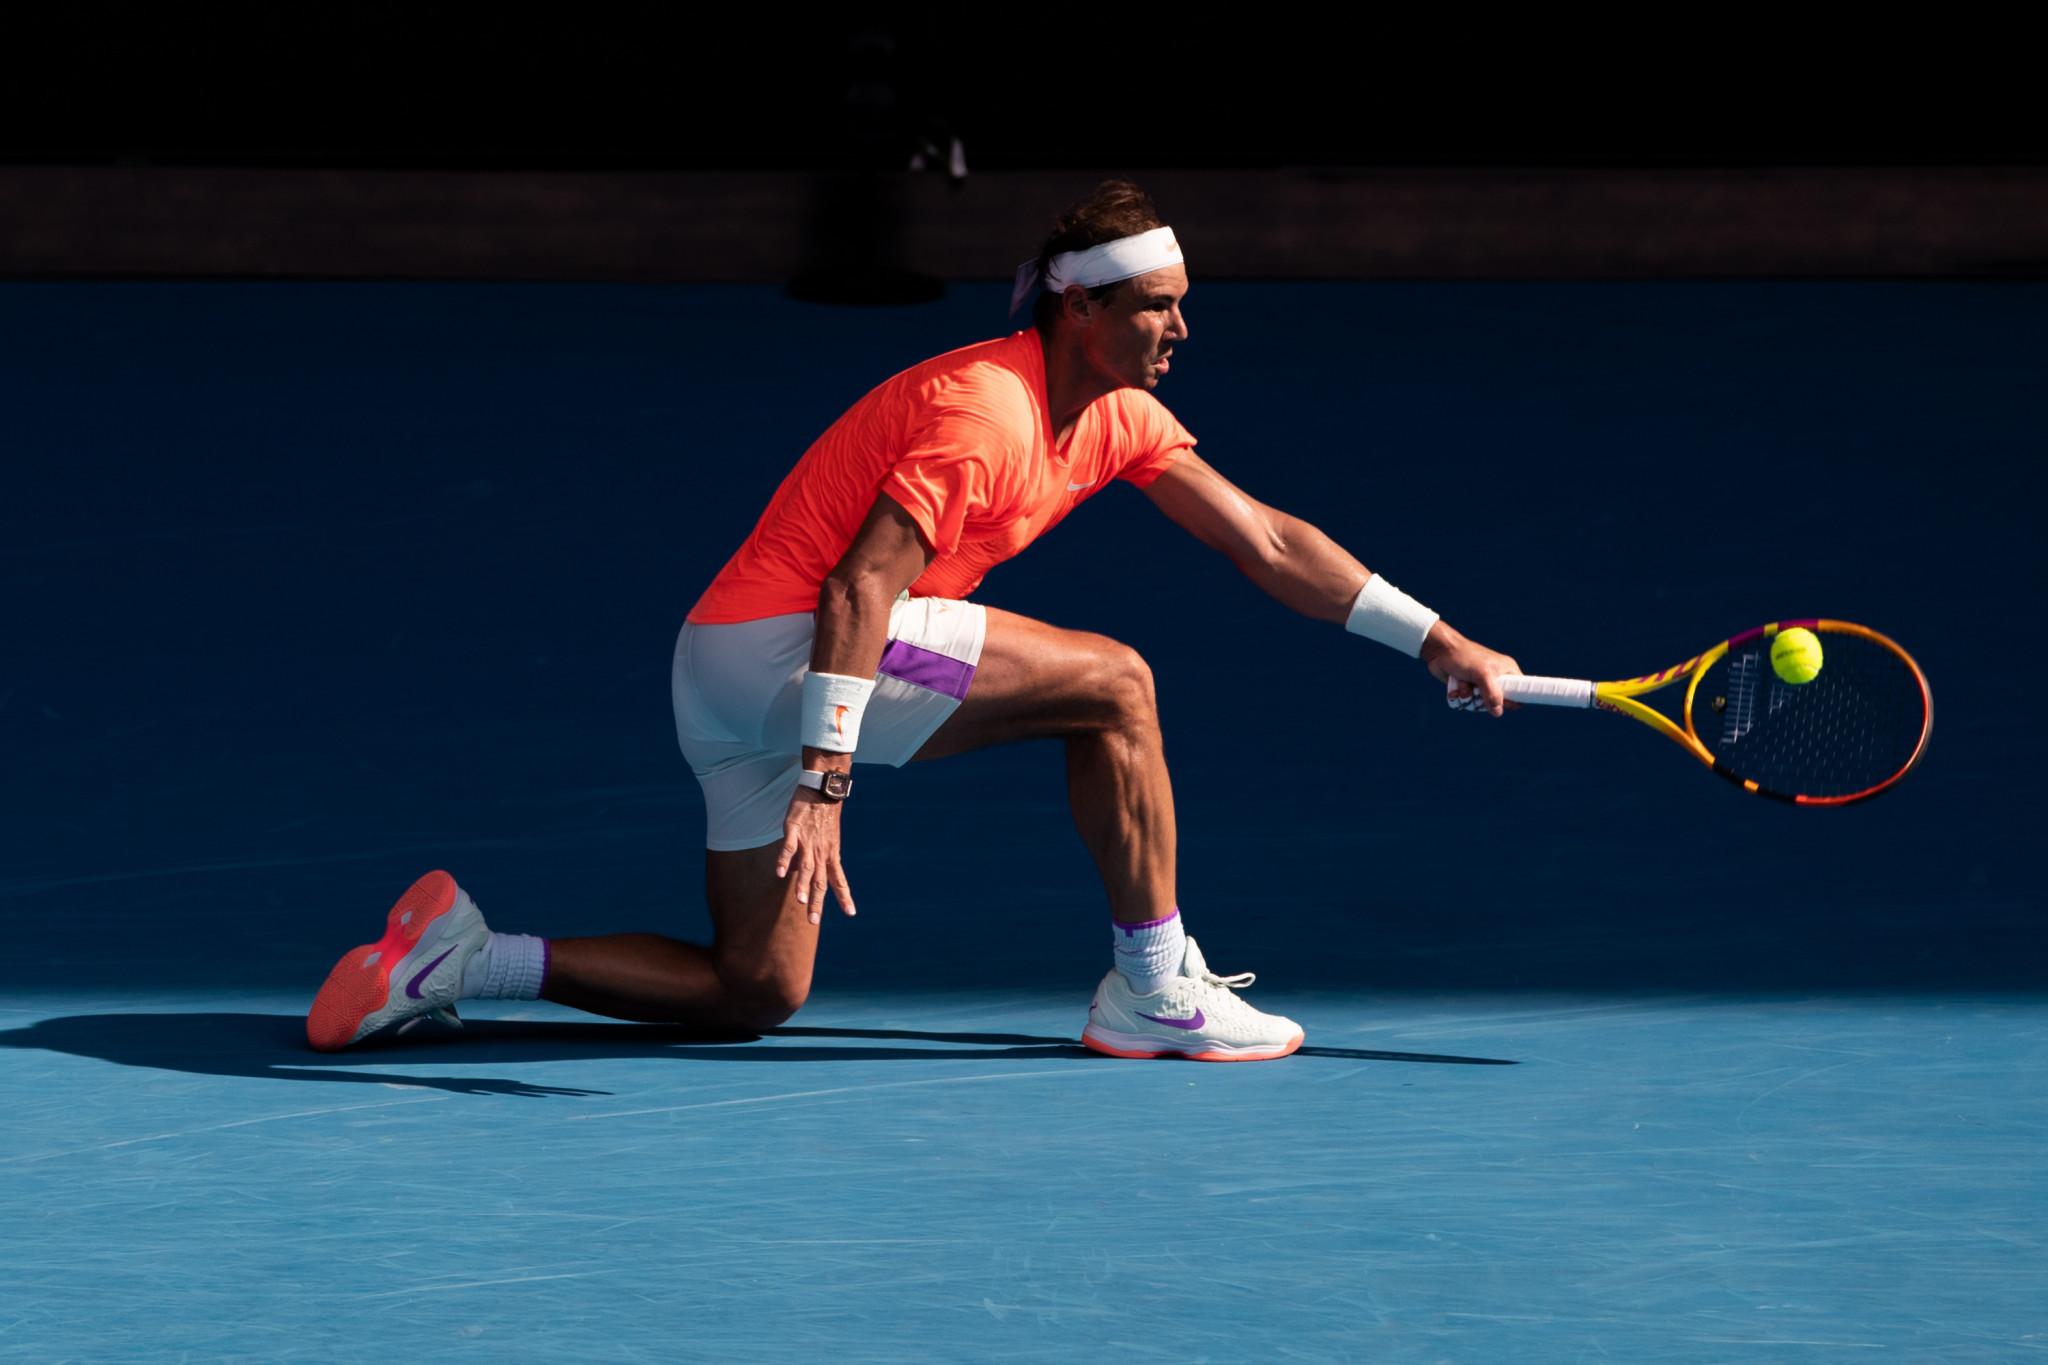 Nadal reaches 43rd Grand Slam quarter-final at Australian Open